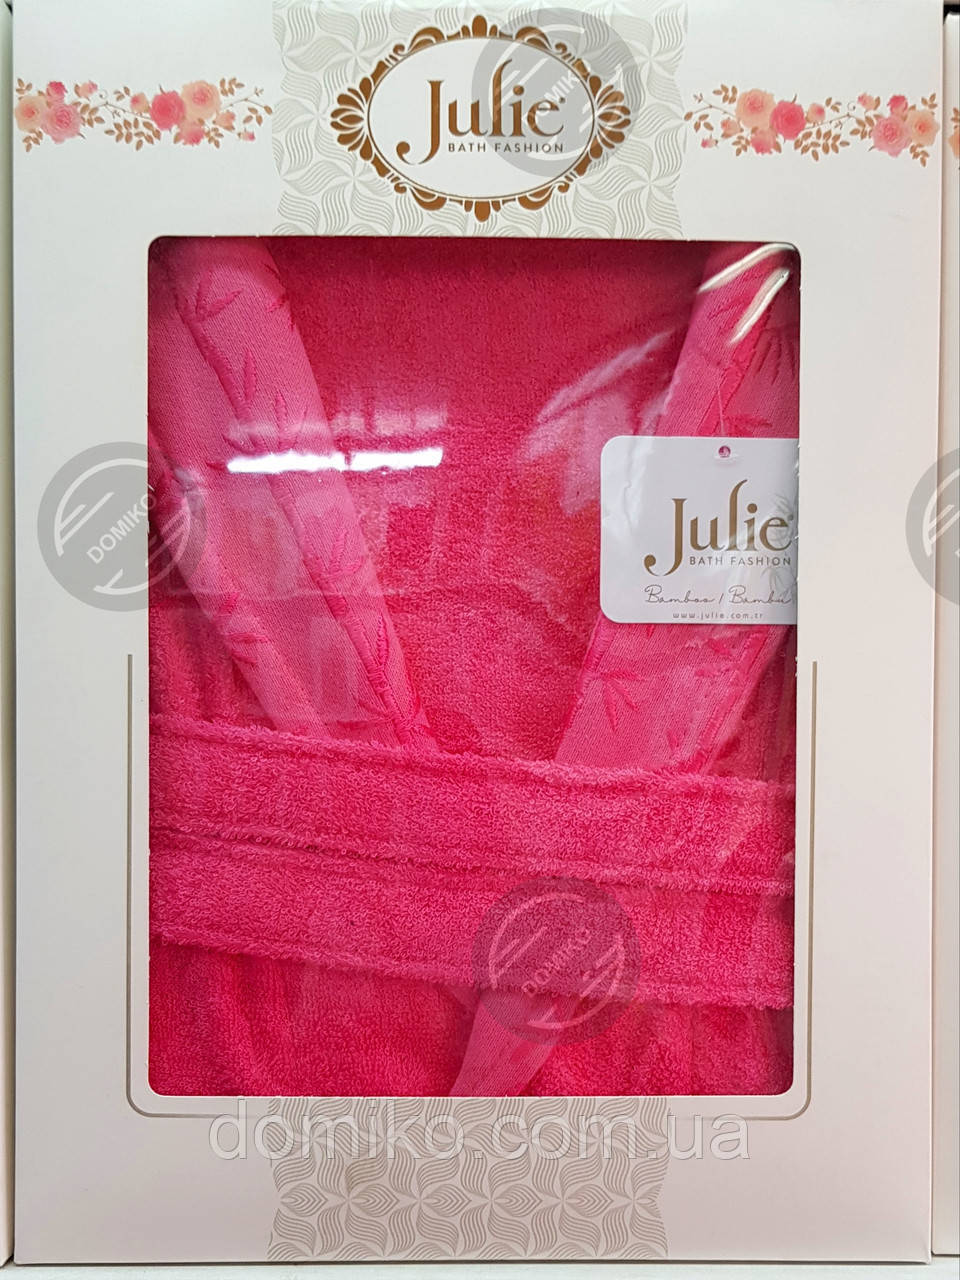 Халат бамбуковый унисекс Julie XXL (54) малиновый